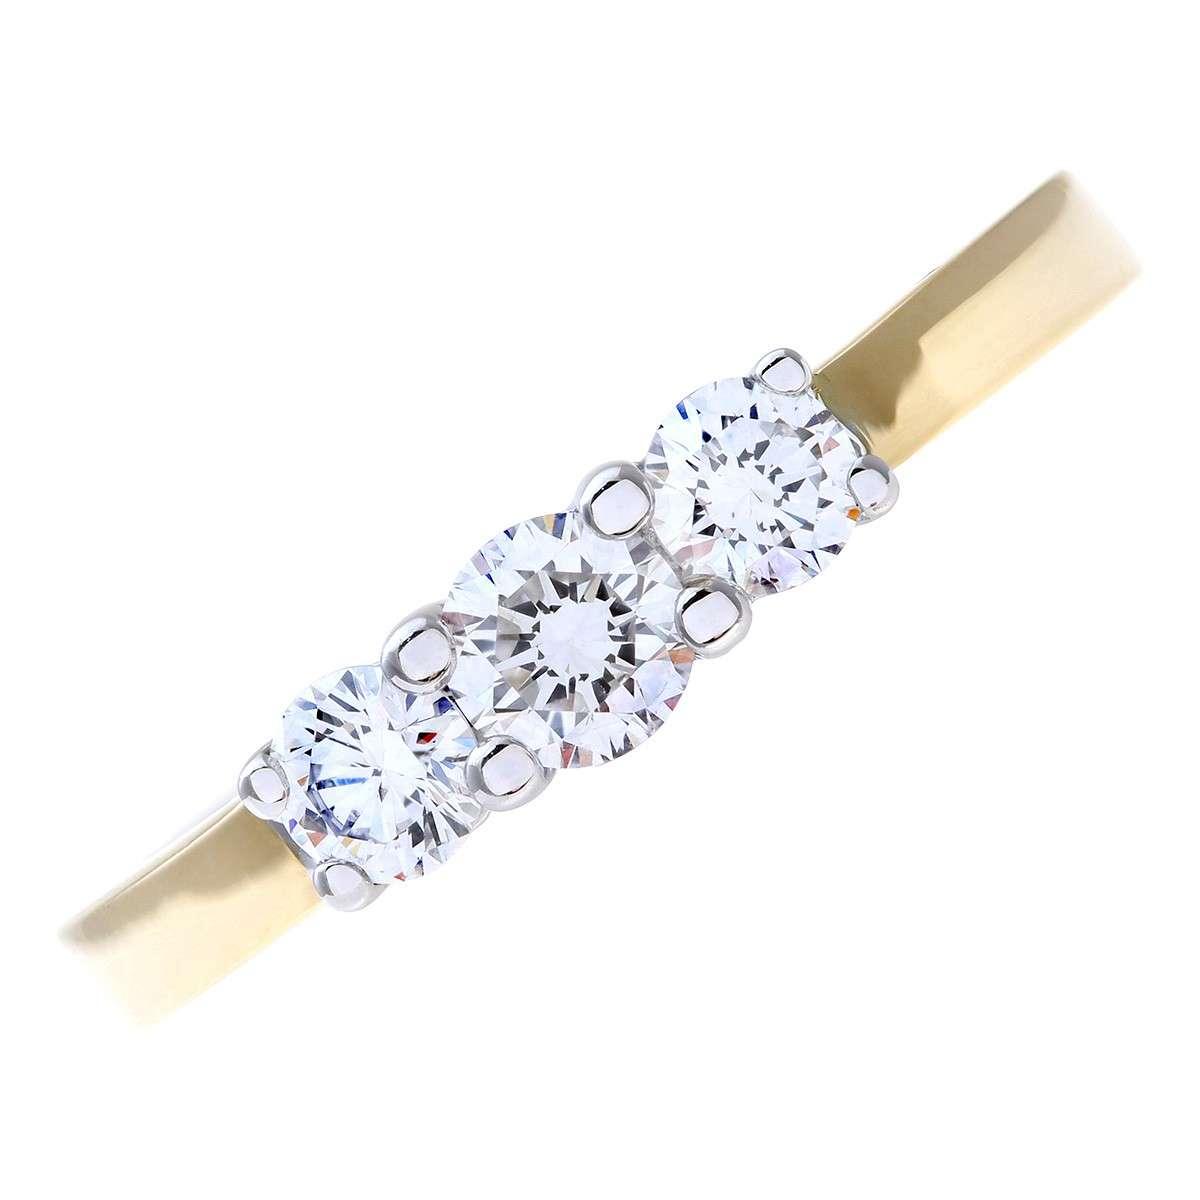 18CT YELLOW GOLD 0.50CT DIAMOND 3 STONE RING